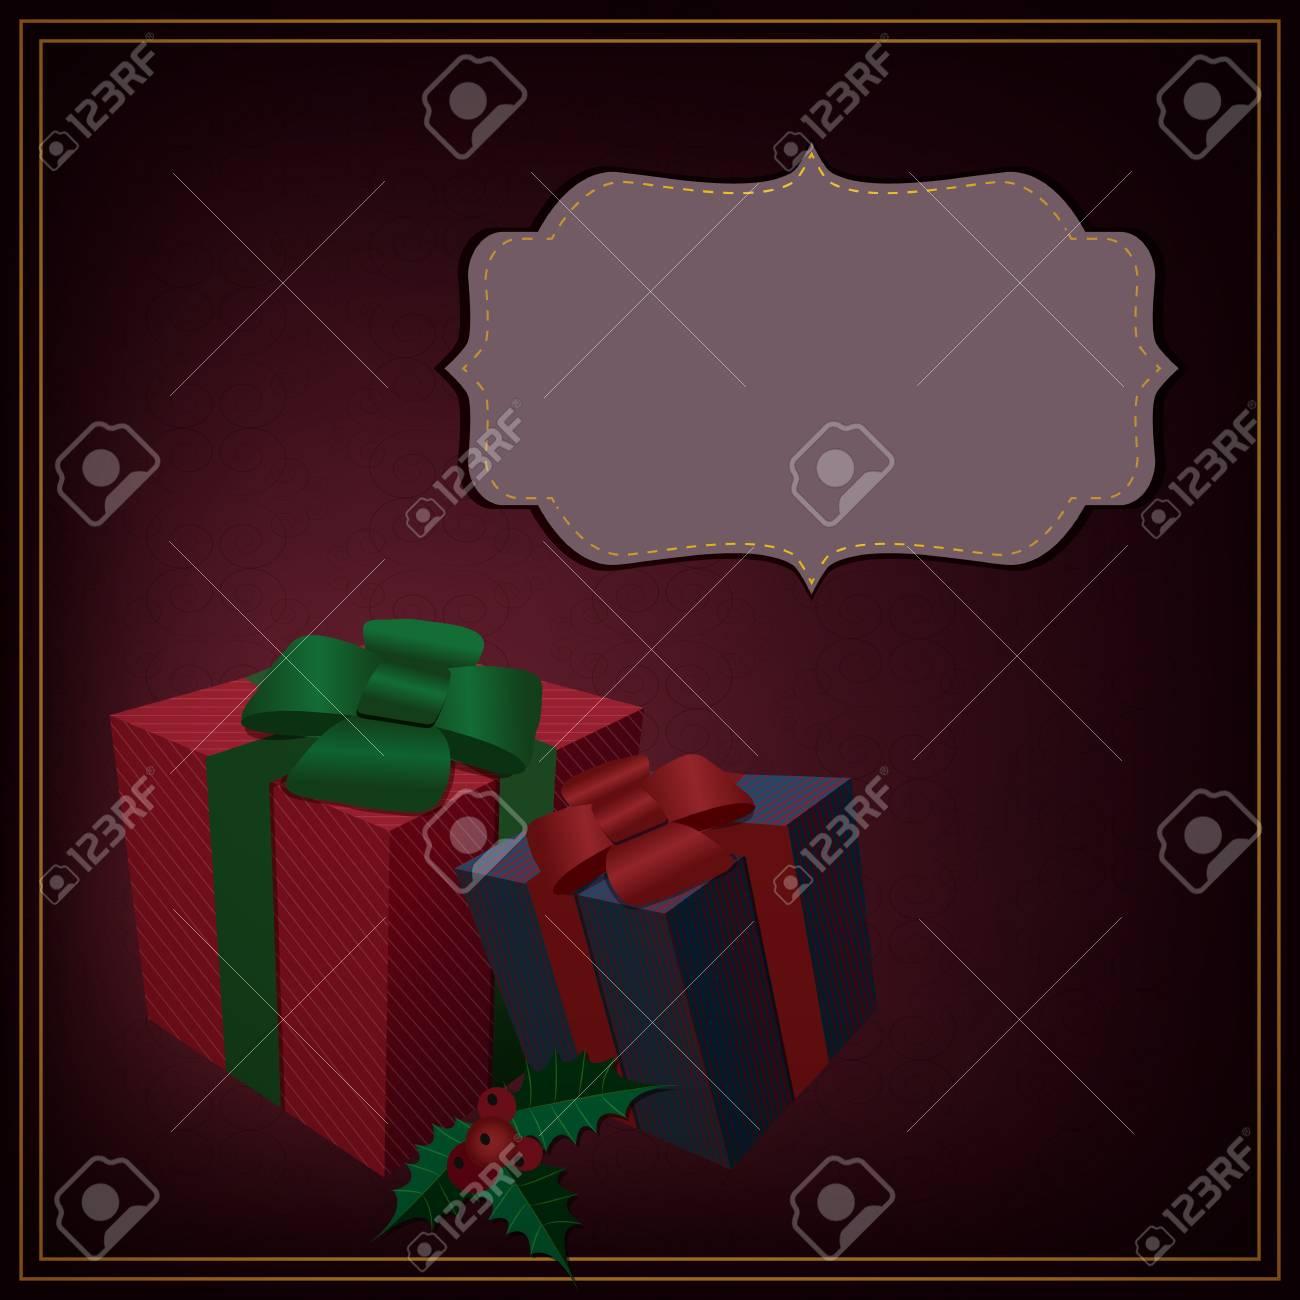 Regali Di Natale Eleganti.Immagini Stock Regali Di Natale Elegante Cornice Retro Con I Regali Di Natale Image 15428104